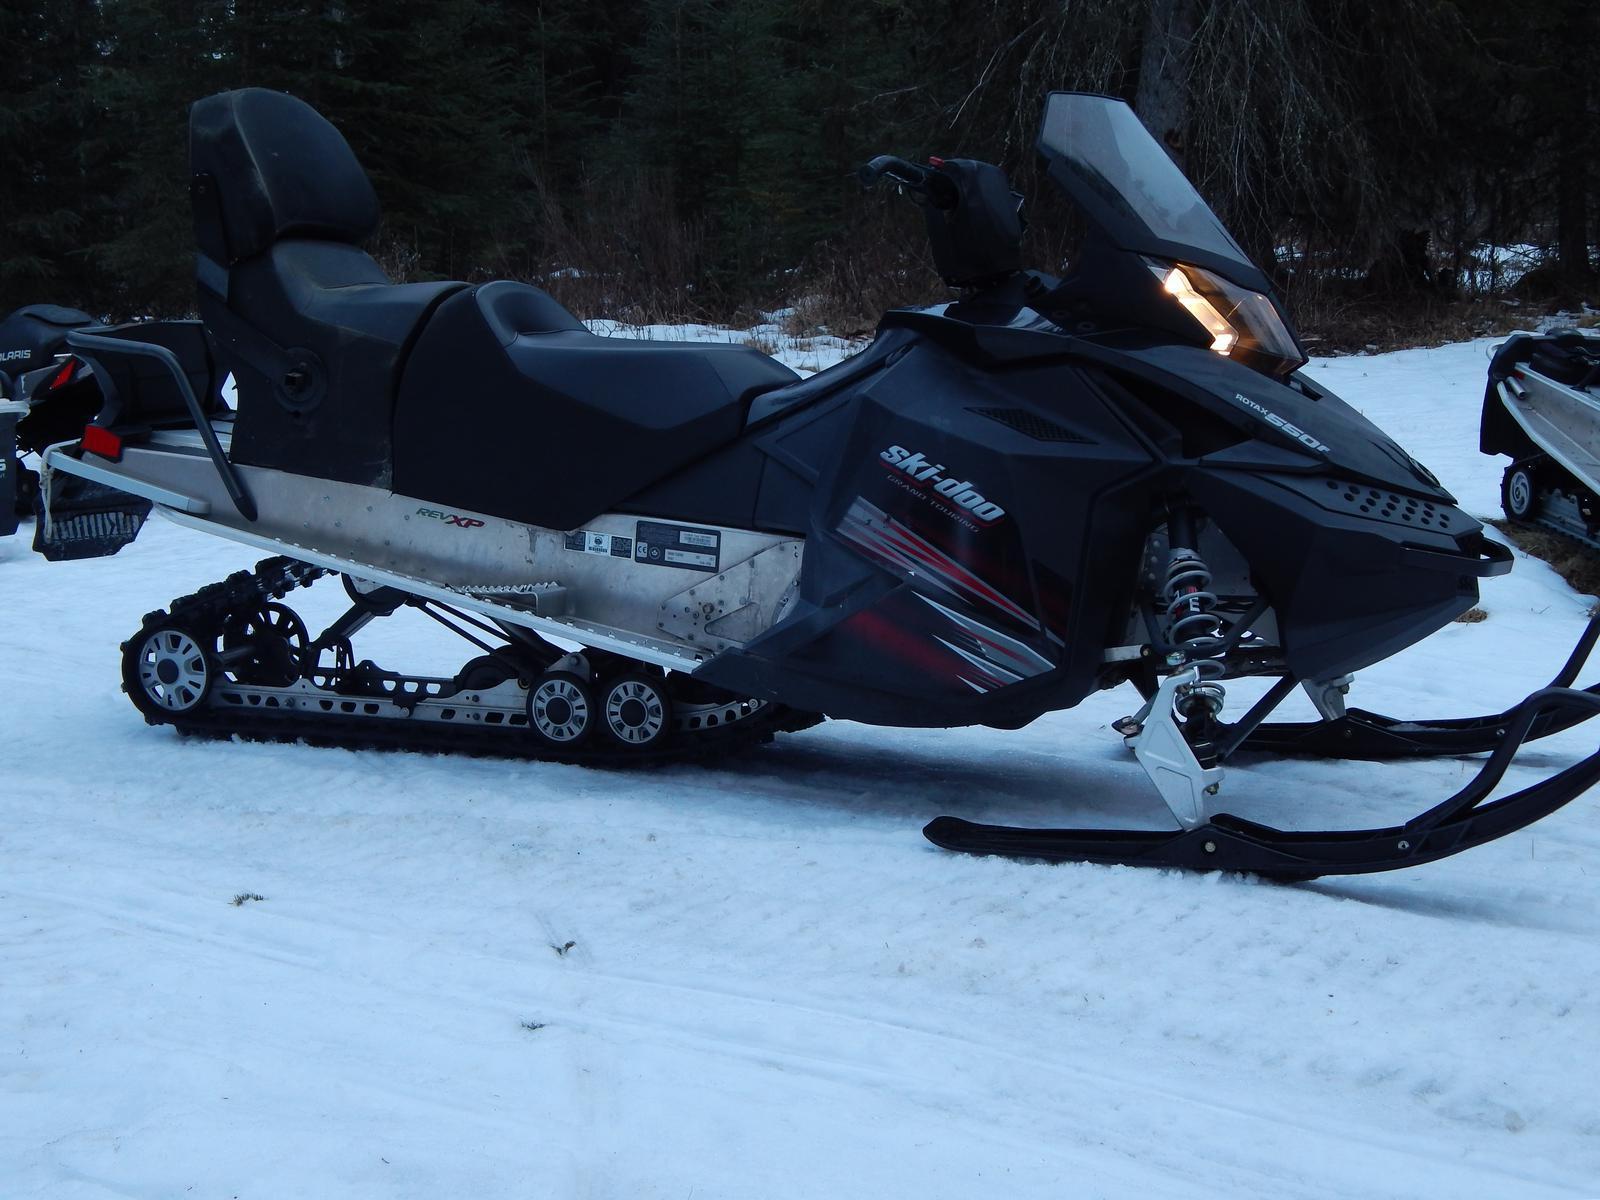 2002 Rev 800 2003 Ski Doo Wiring Diagram Stripped Snowmachines Verbas Hilltop Machine Soldotna 1600x1200